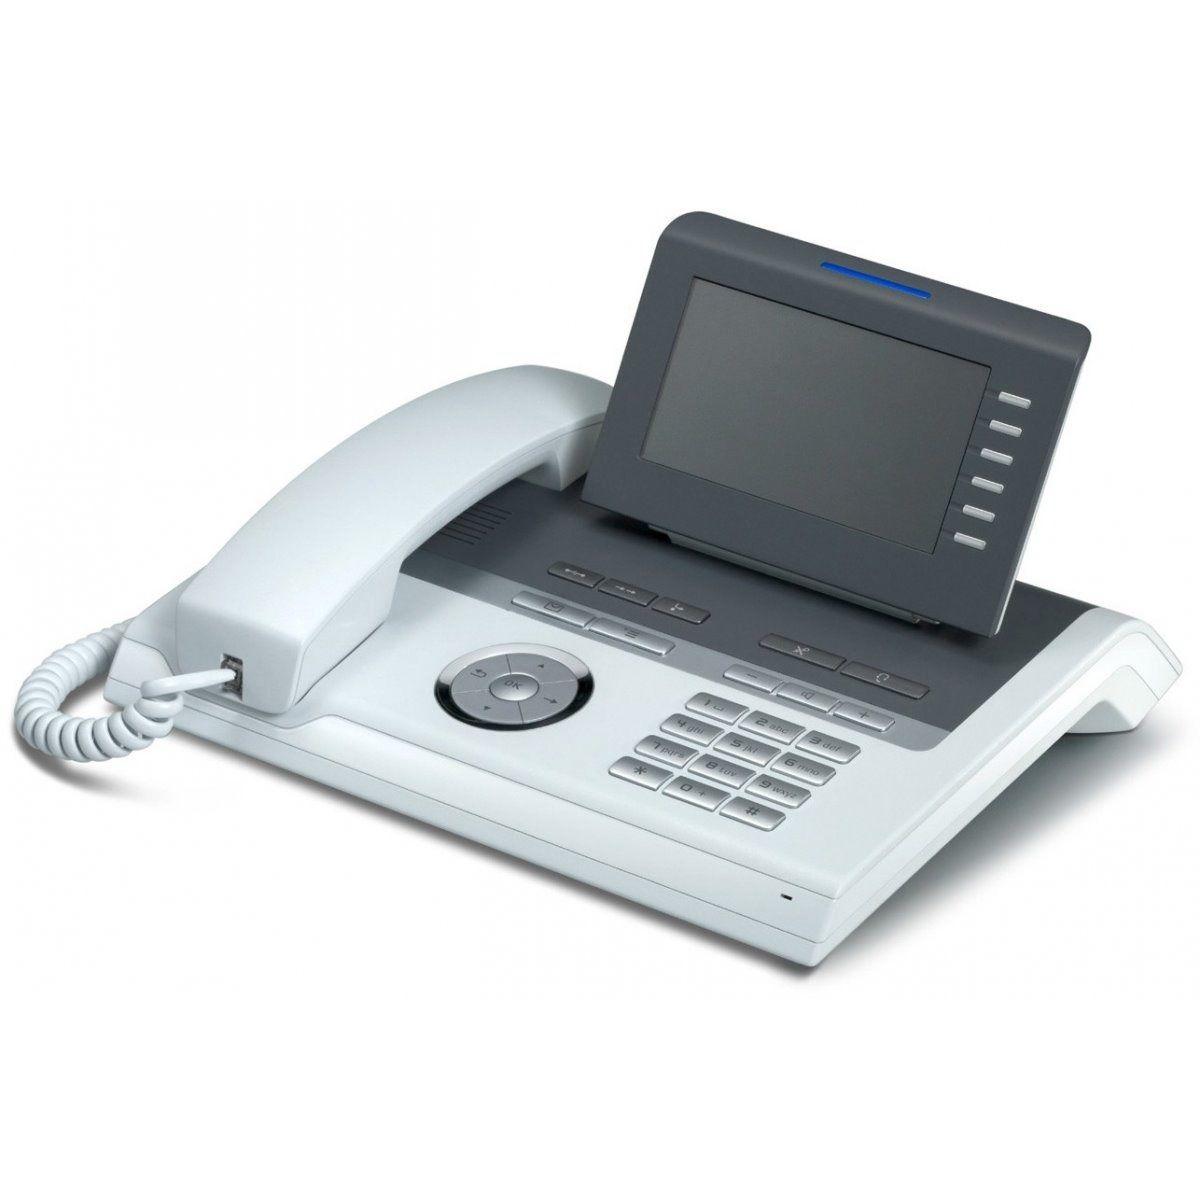 Telefone IP OpenStage 40 SIP - Siemens